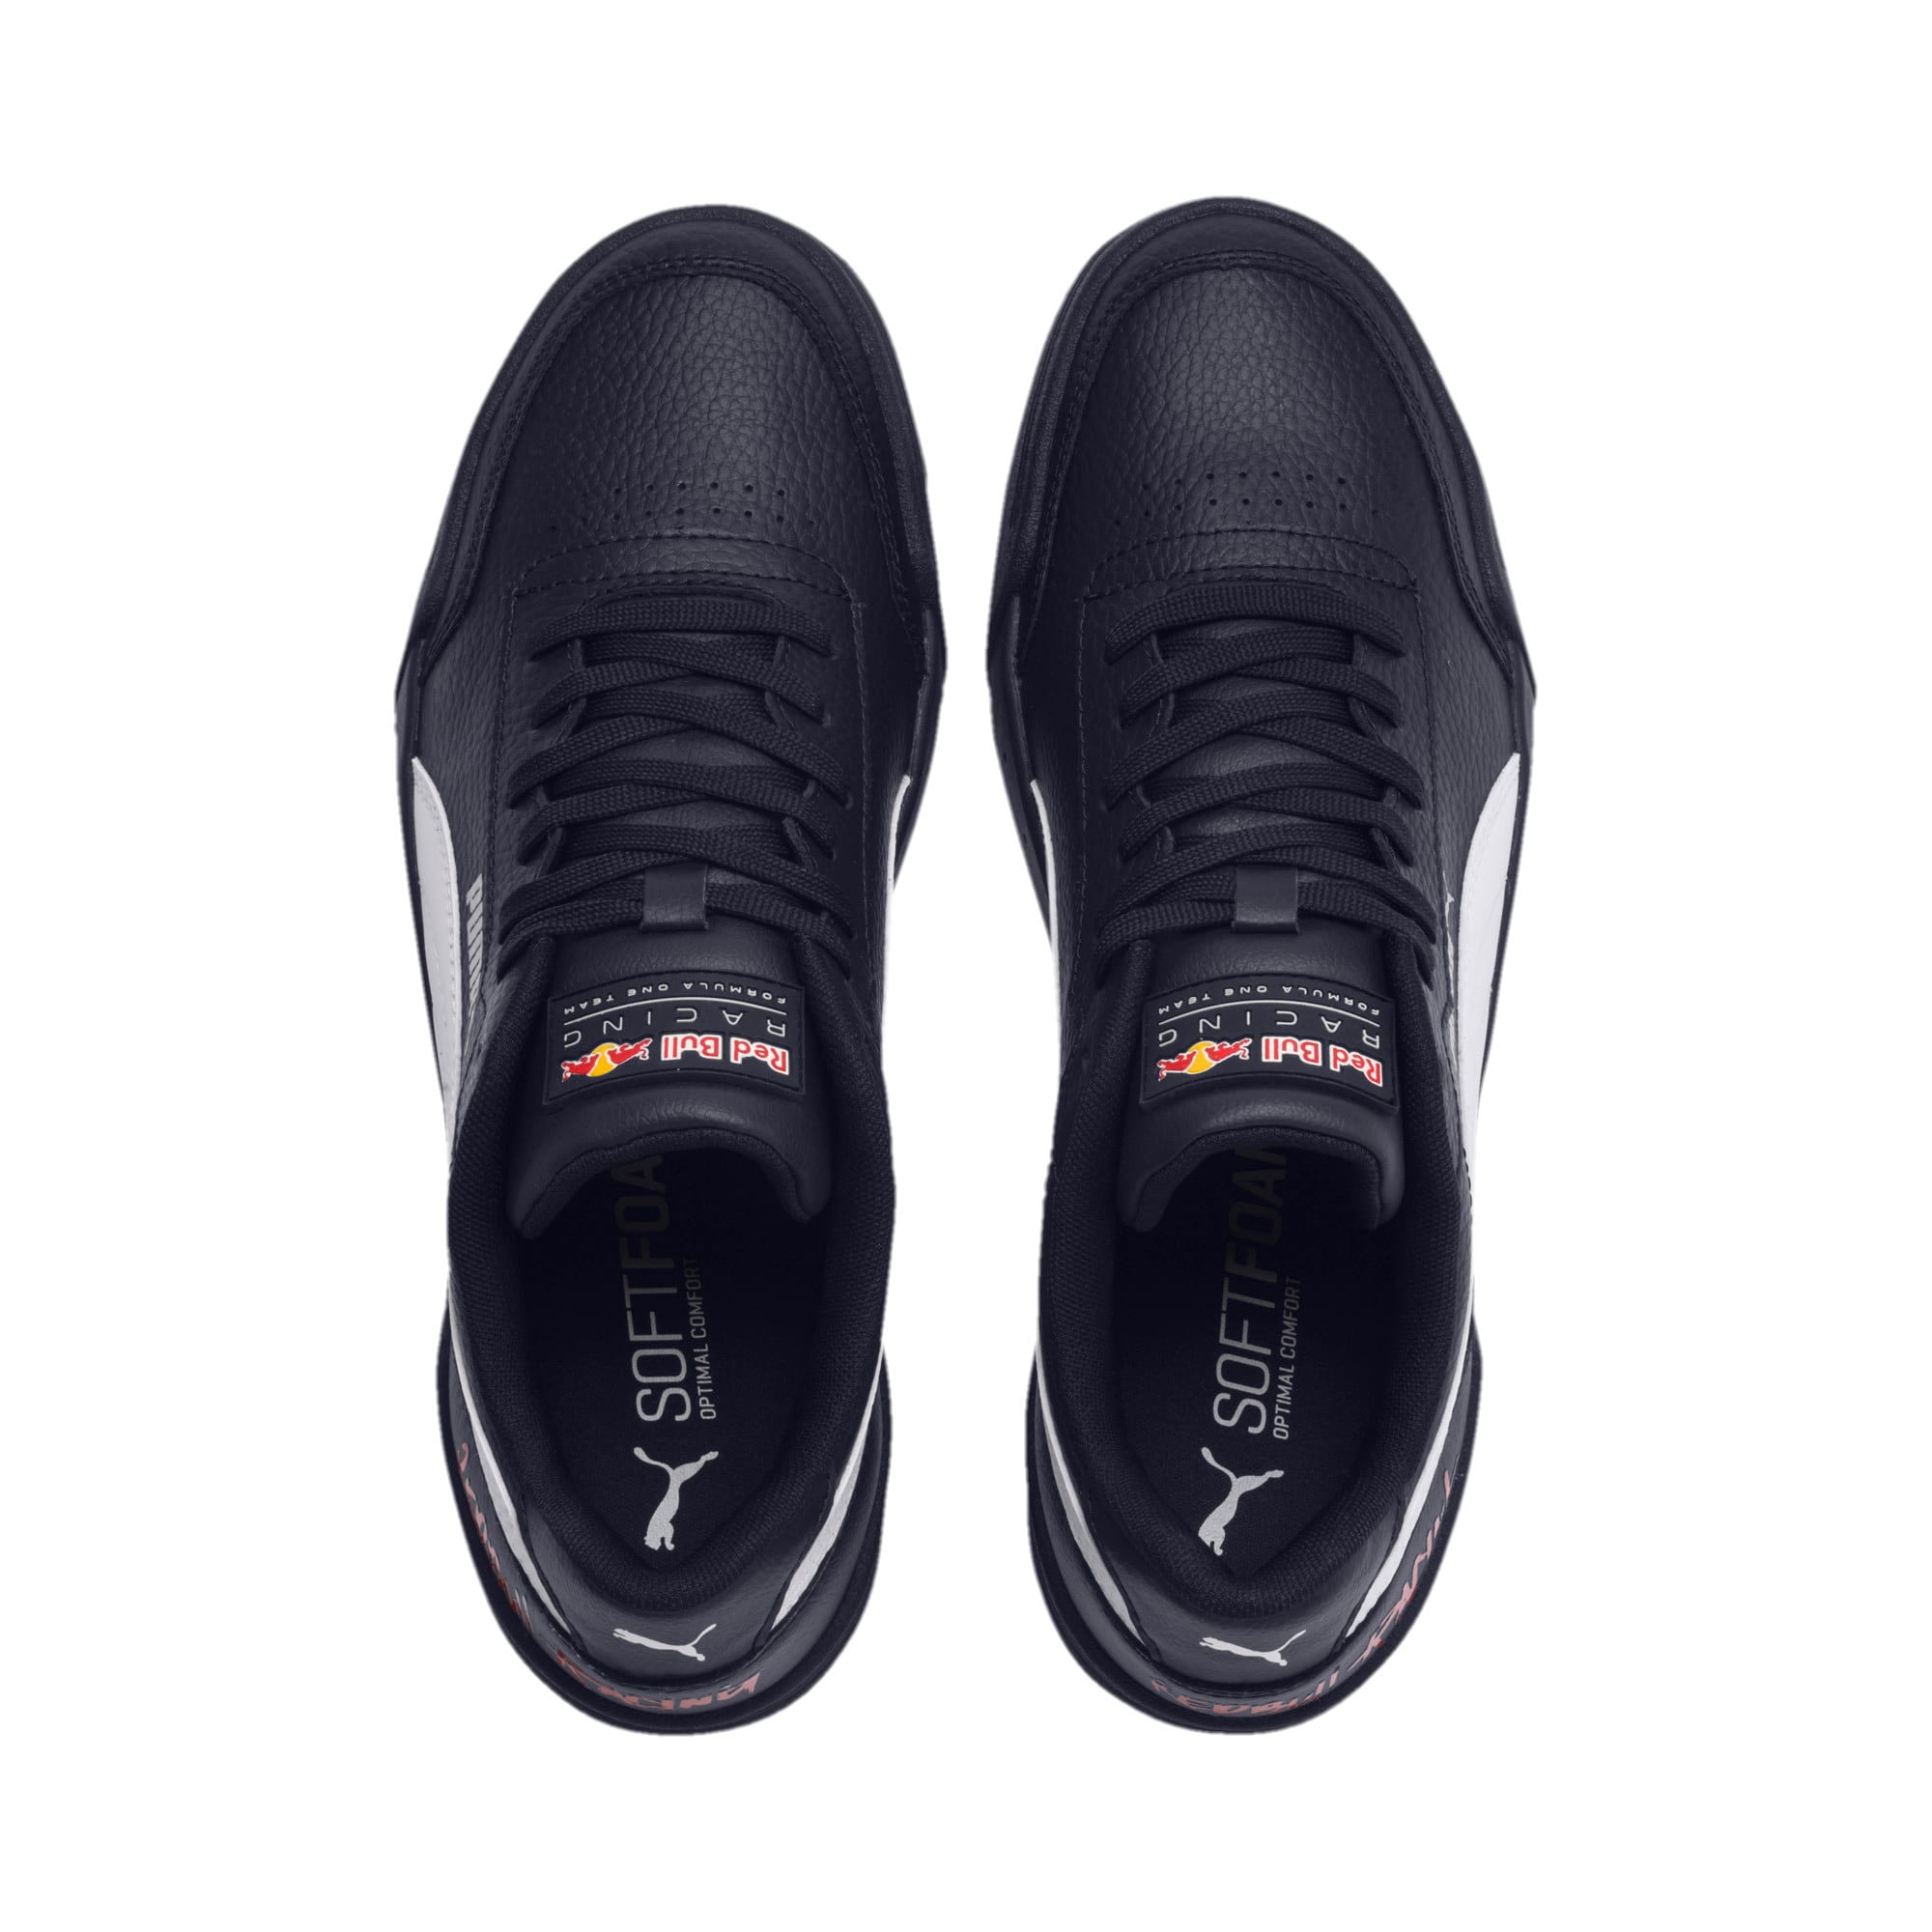 Thumbnail 7 of Red Bull Racing Caracal sneakers, NIGHT SKY-PumaWhite-NIGHTSKY, medium